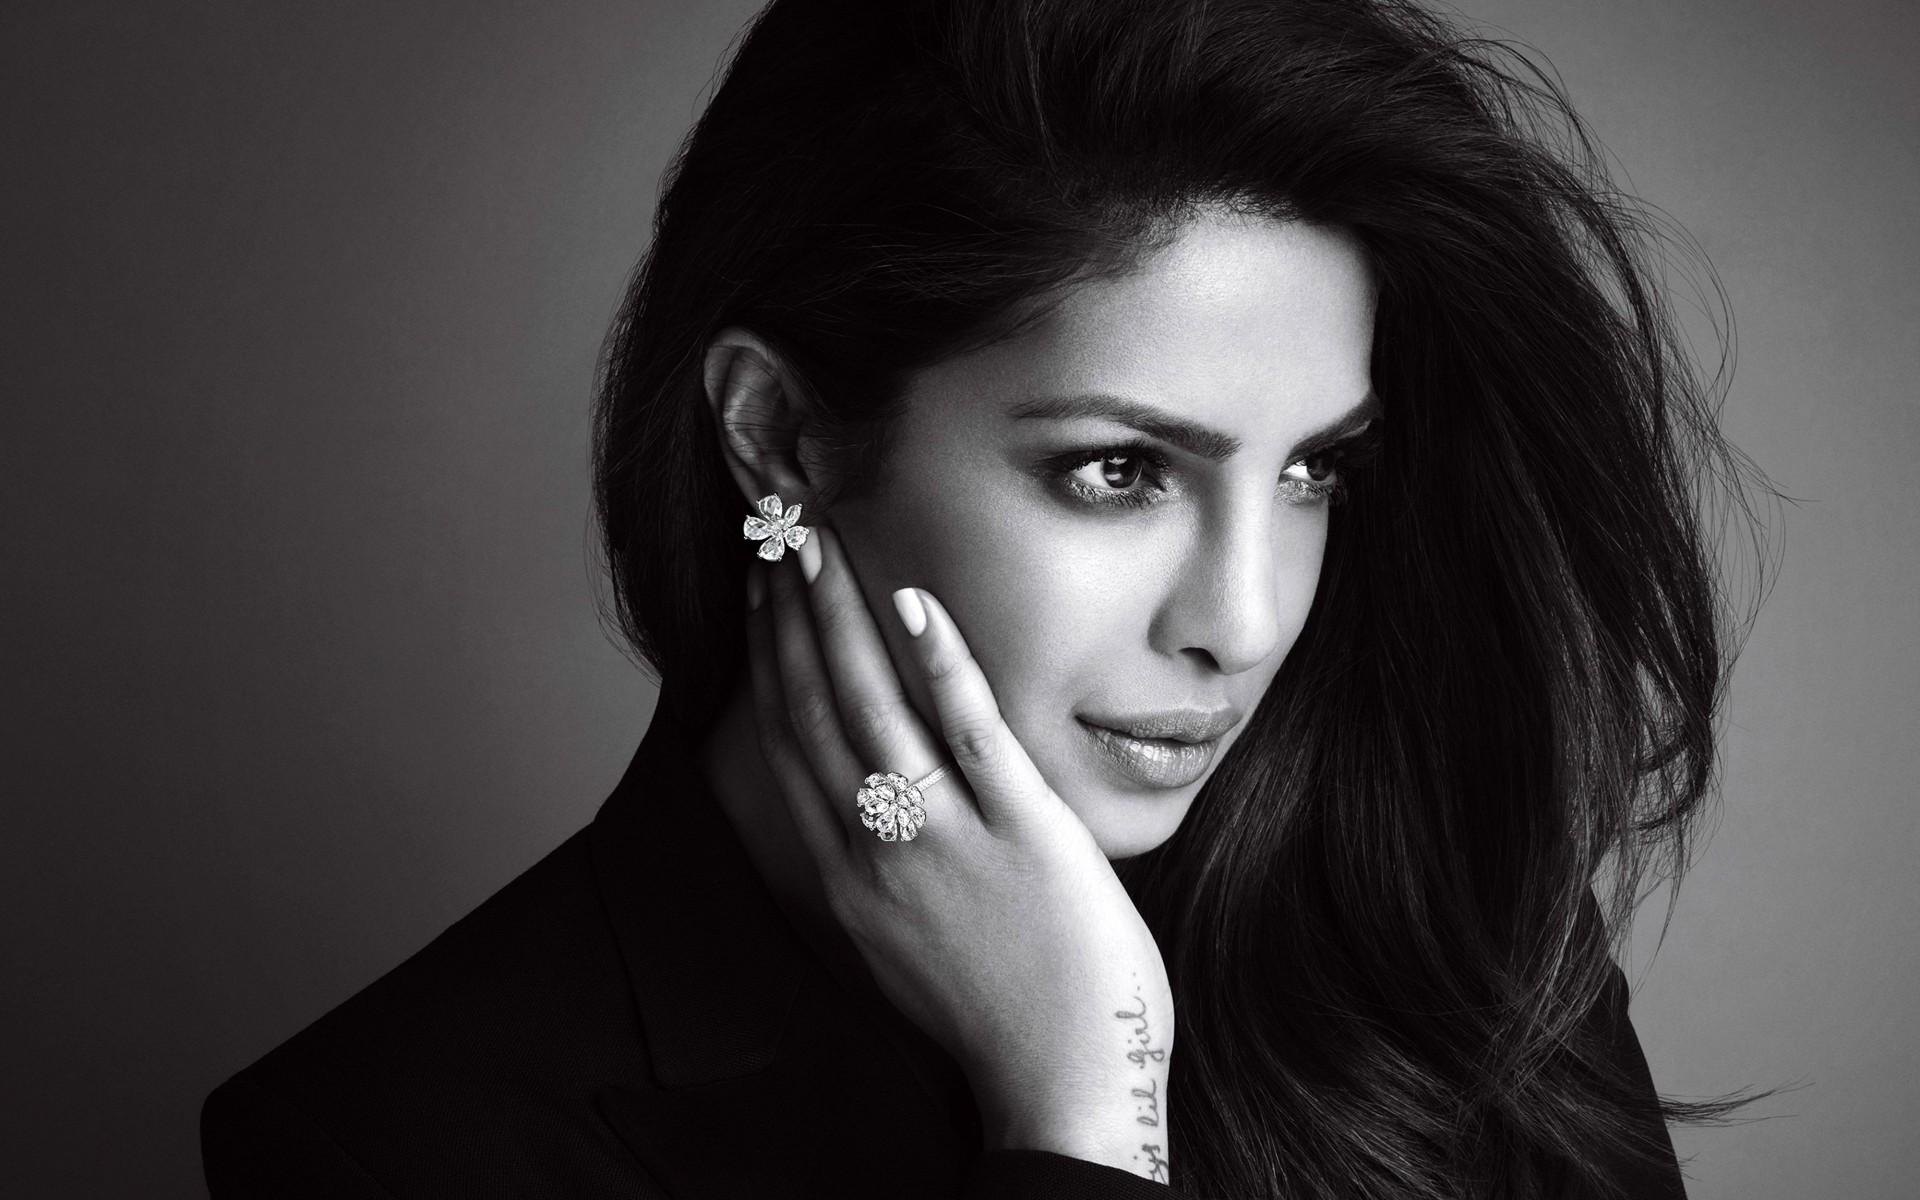 Victoria Secret Wallpaper Iphone 5 Priyanka Chopra 2017 4k Wallpapers Hd Wallpapers Id 20967